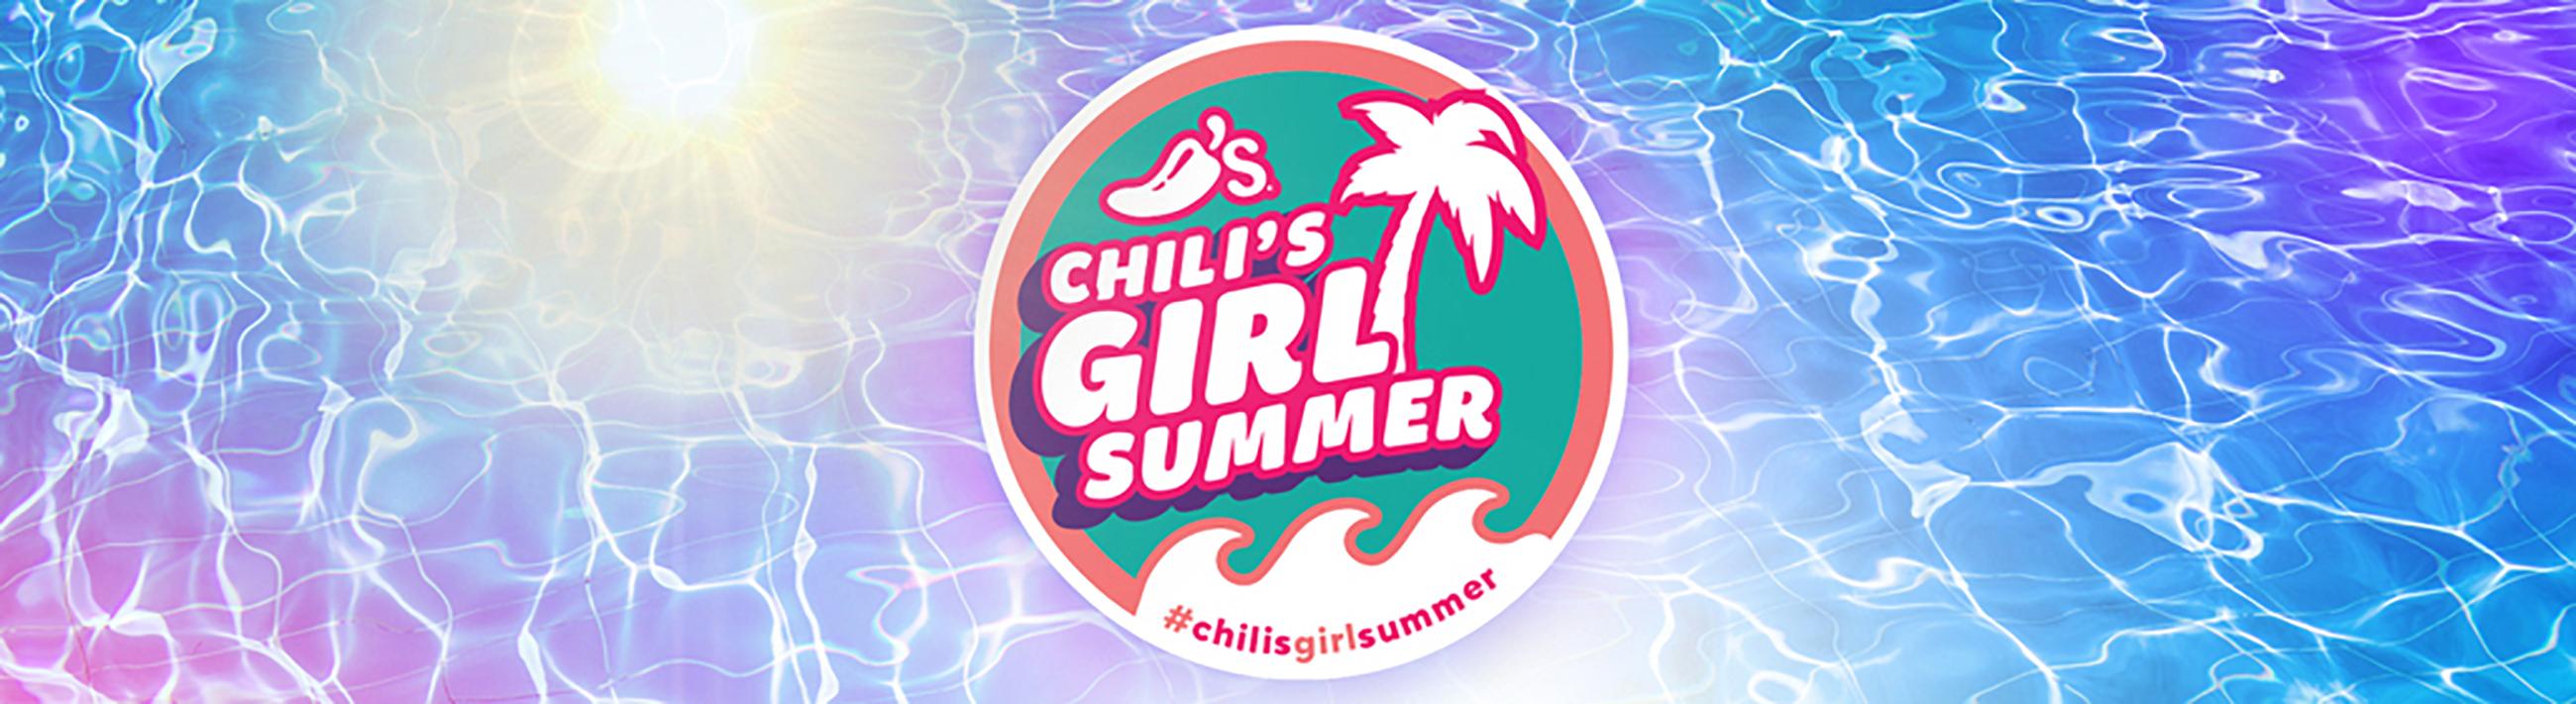 BREAKING NEWS: CHILI'S GIRLS WIN THE SUMME...